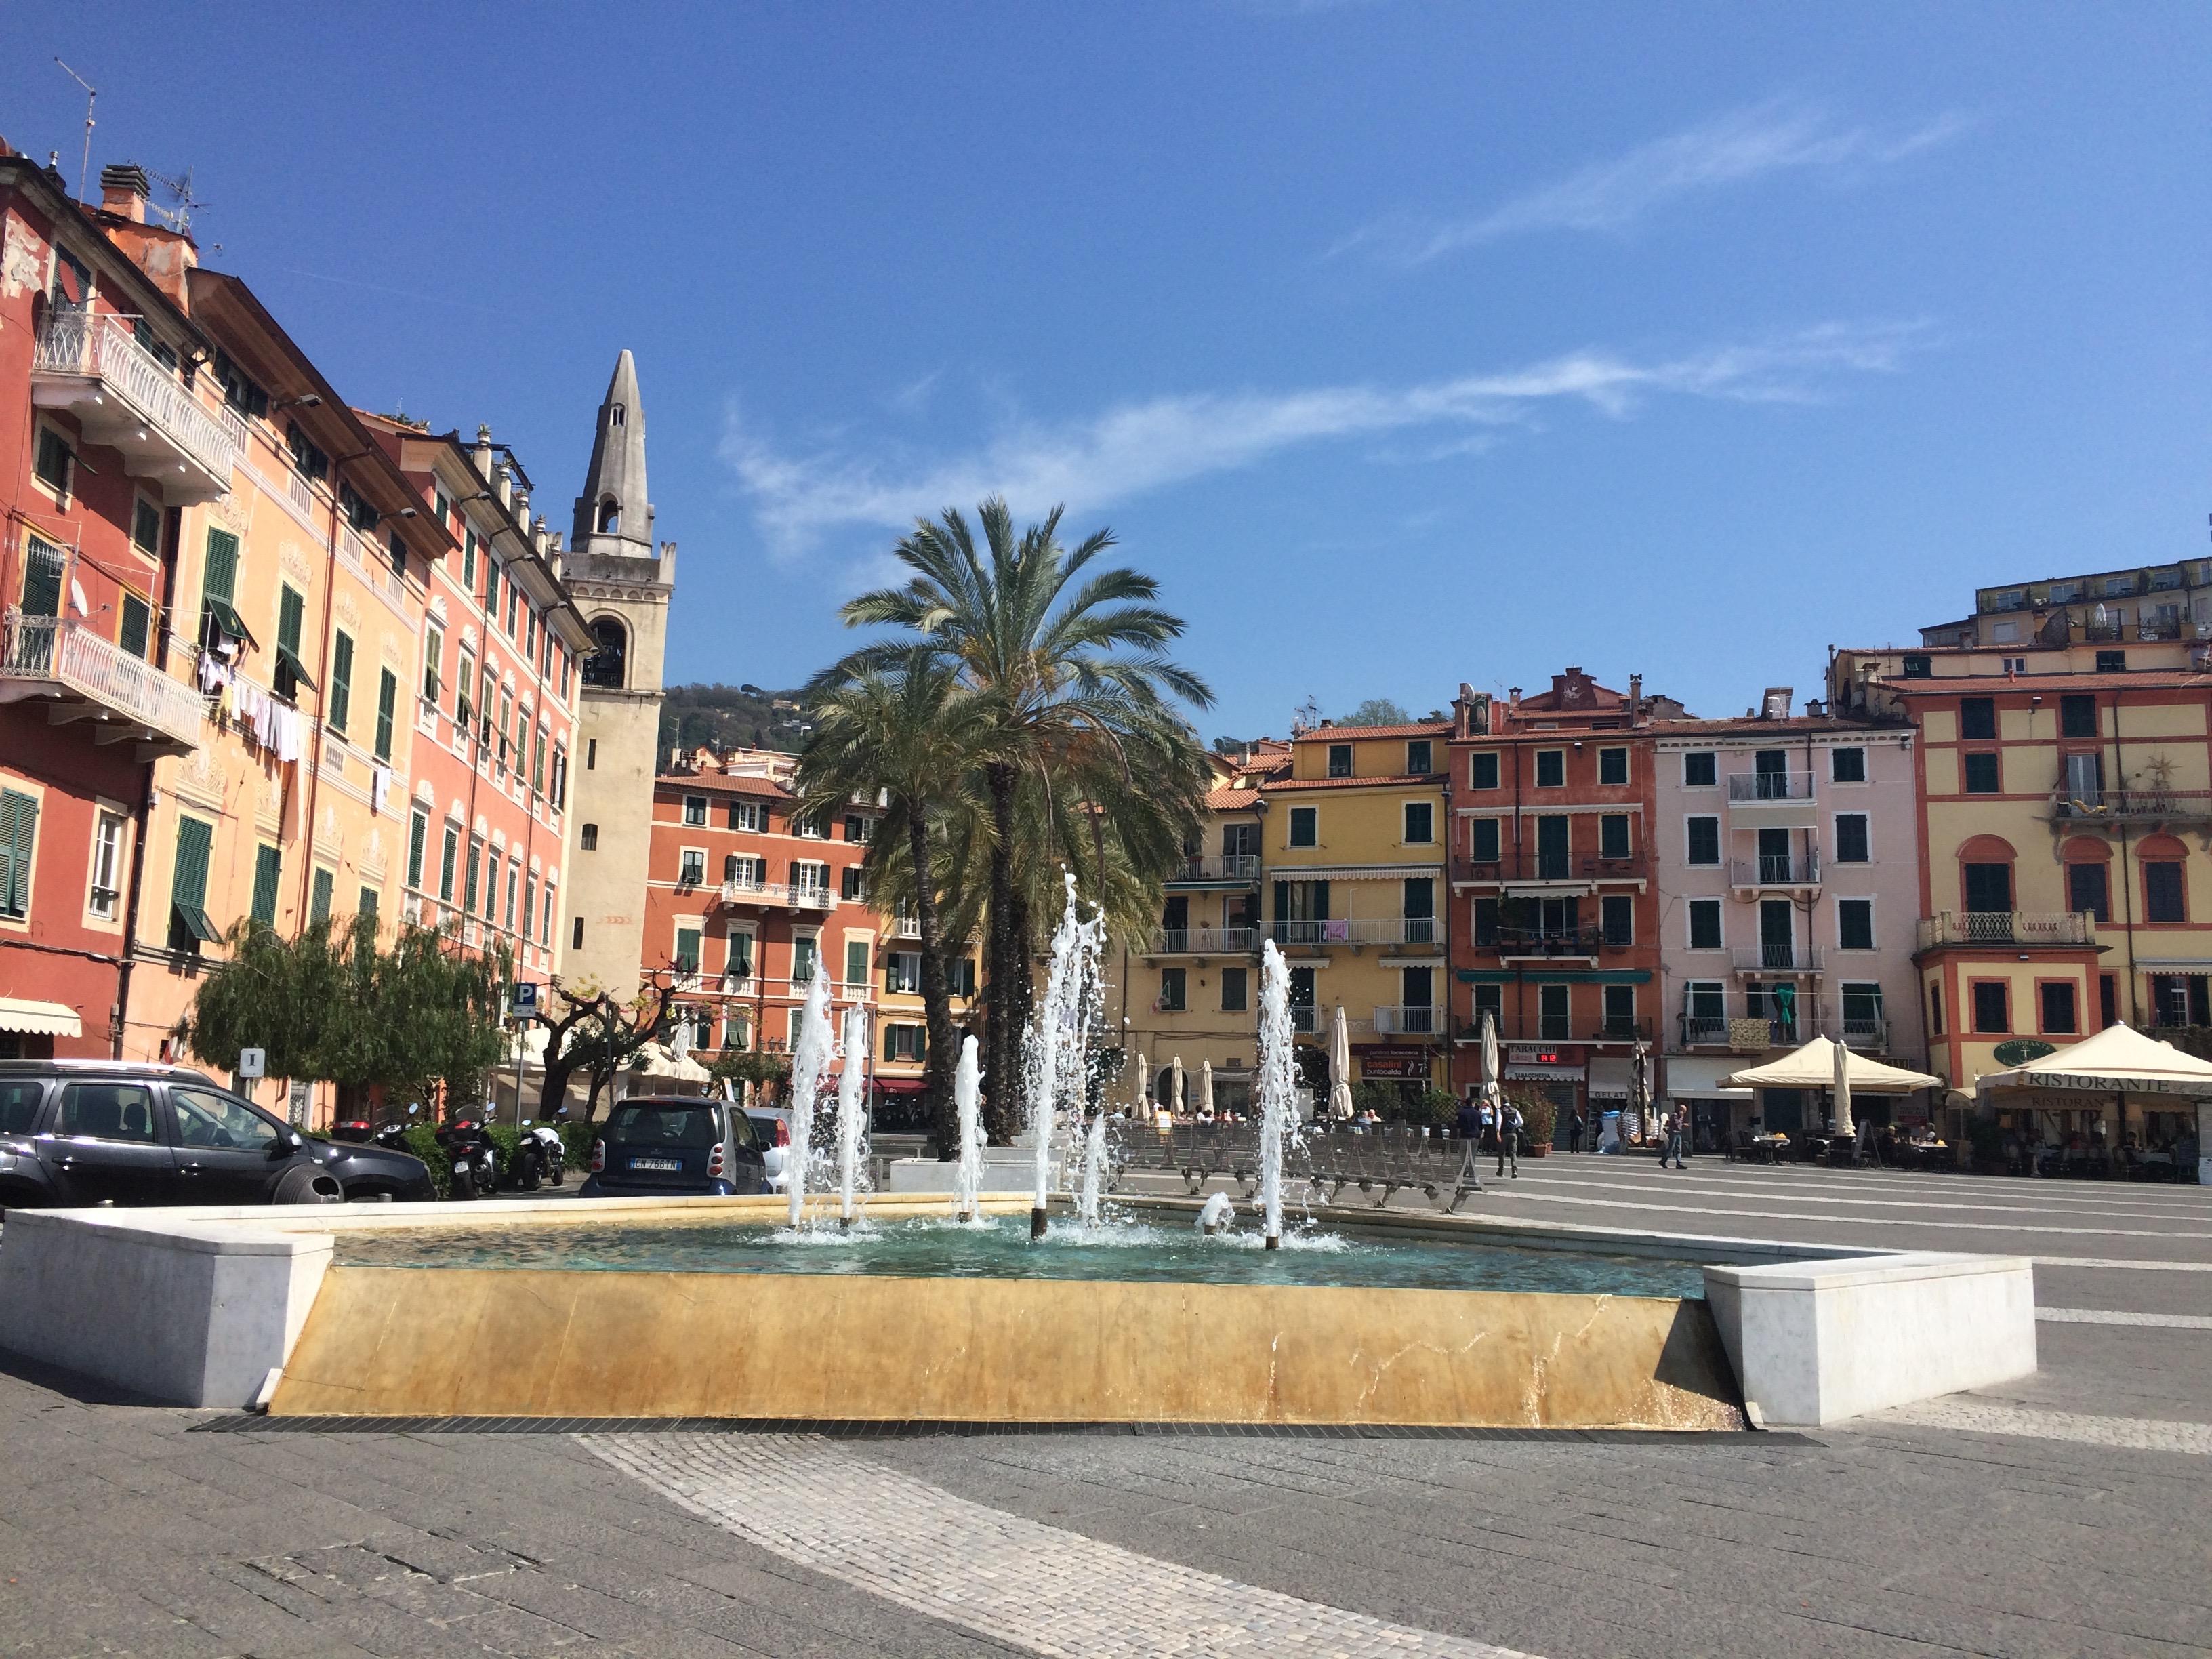 Liguria - Lerici Piazza Giuseppe Garibaldi